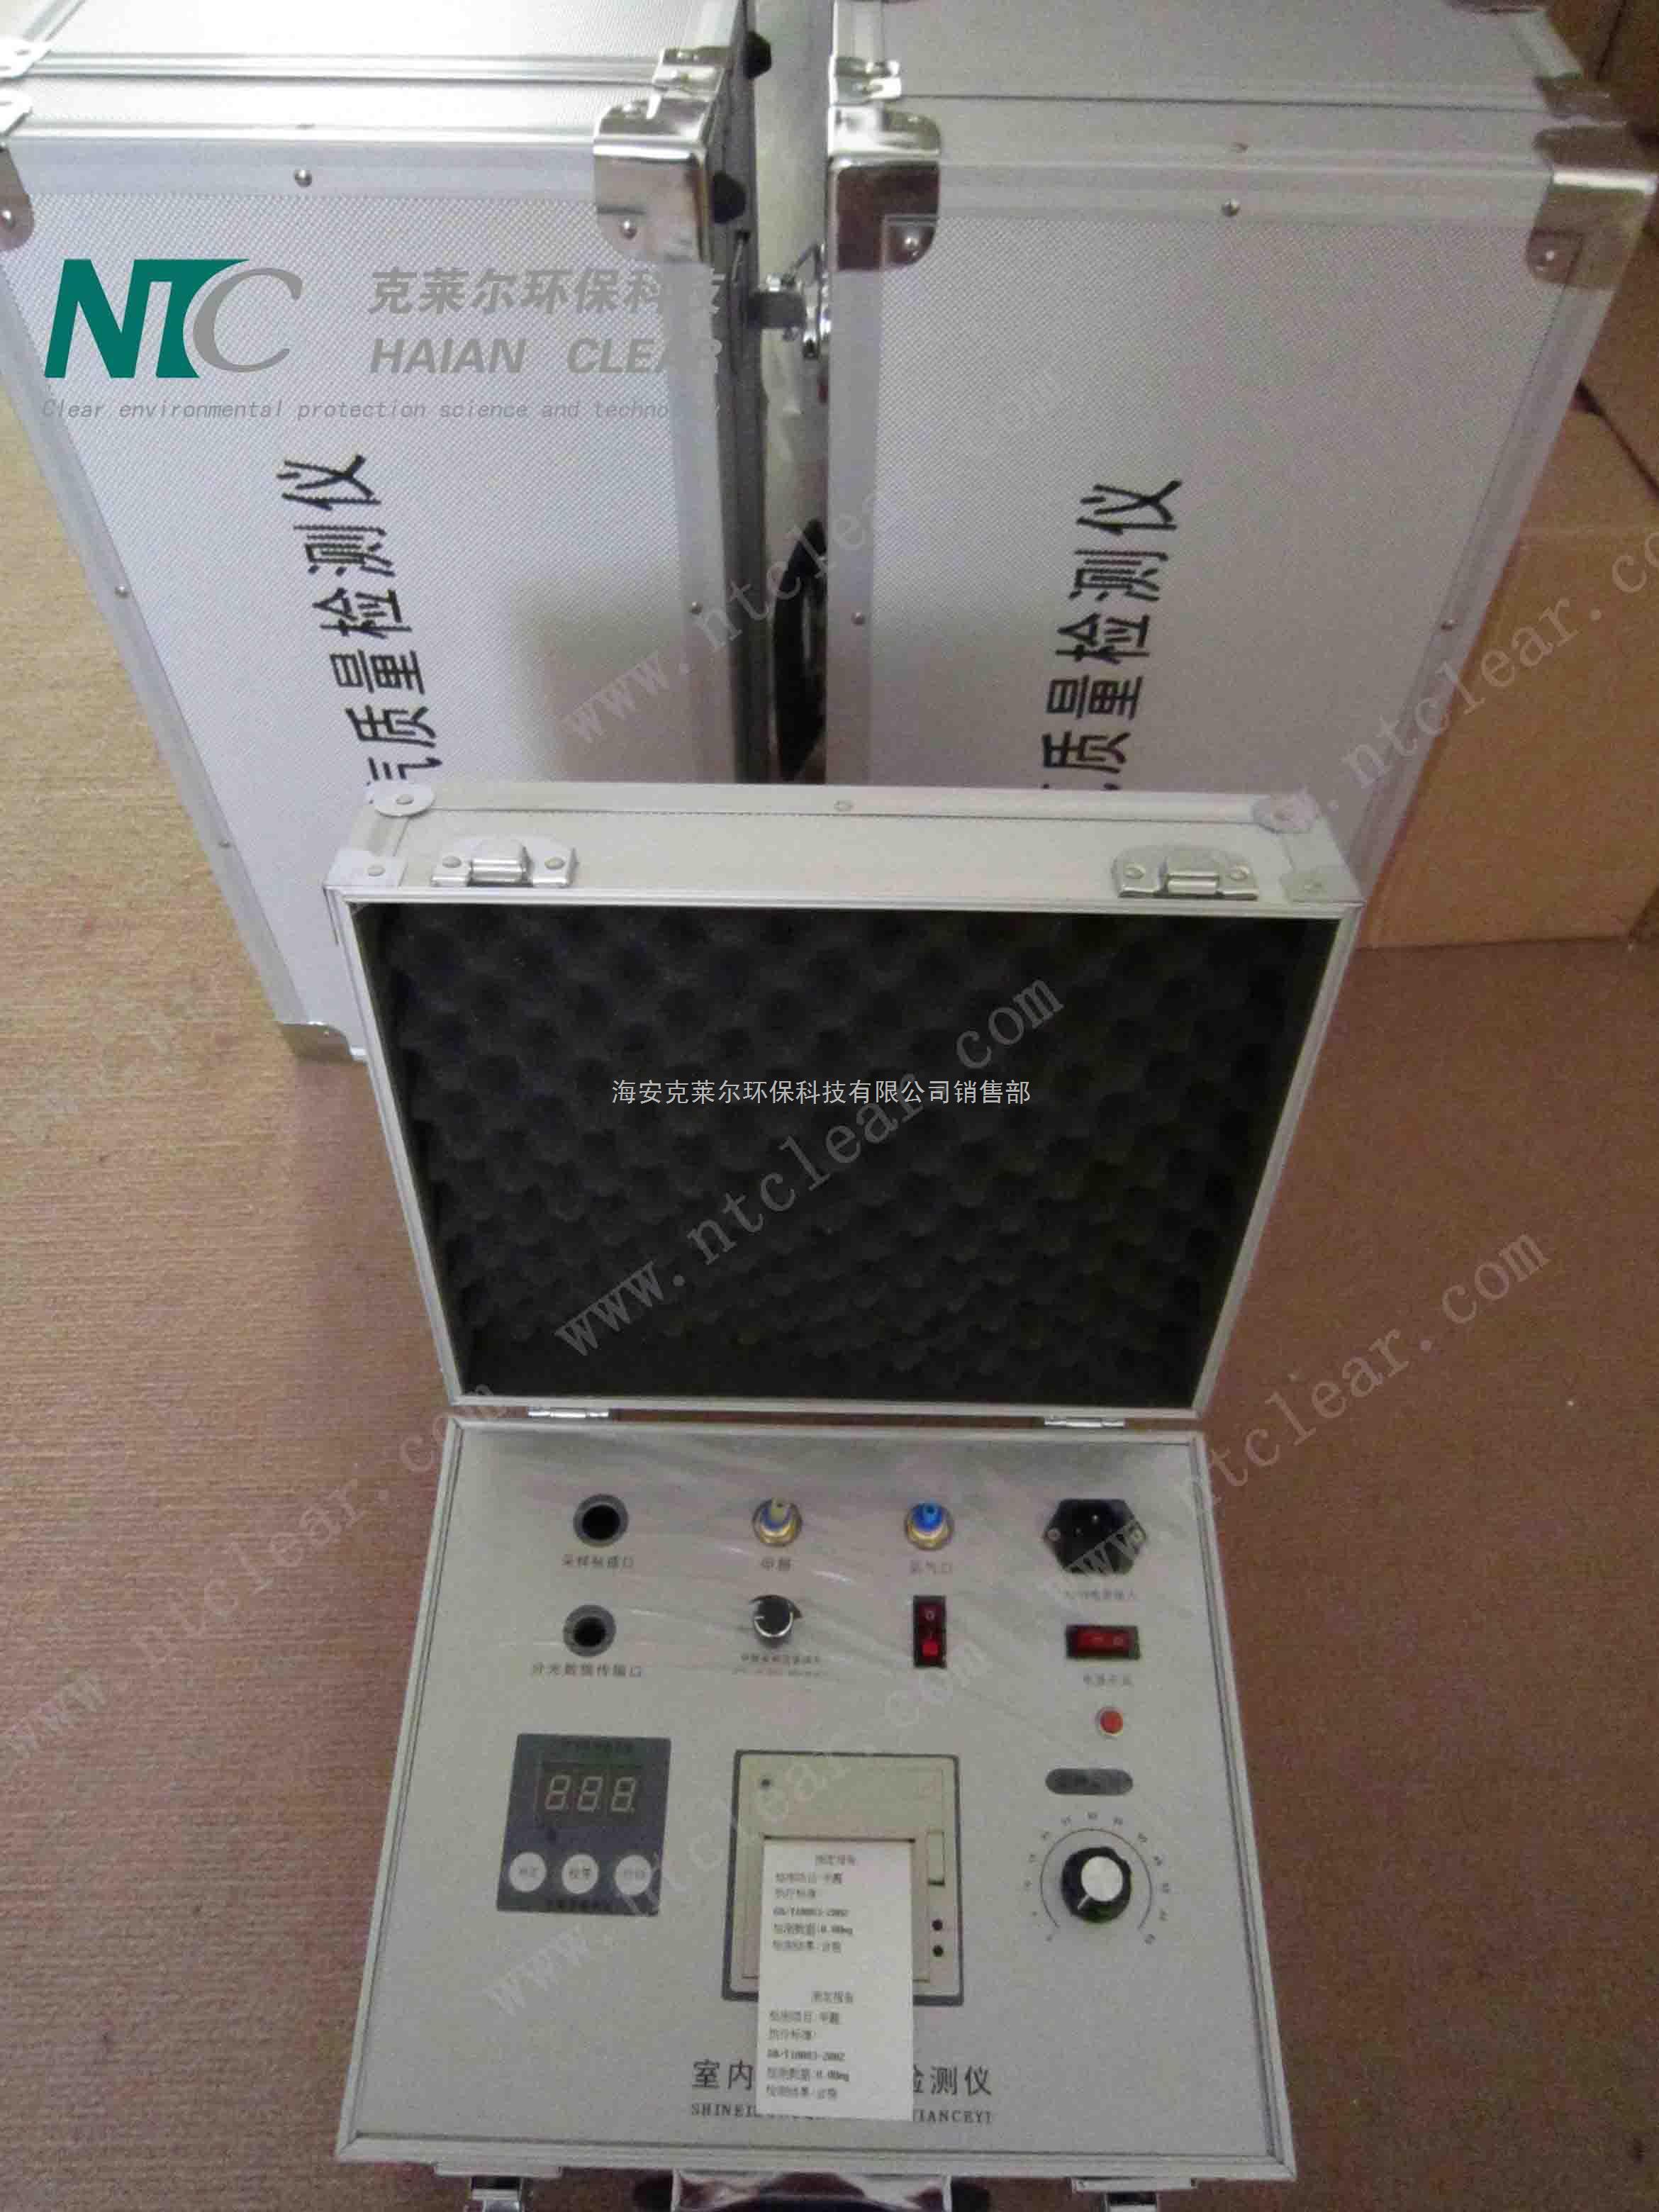 NTC-1-昆明廈門八合一甲醛檢測儀哪里有賣/甲醛檢測儀結果準確嗎